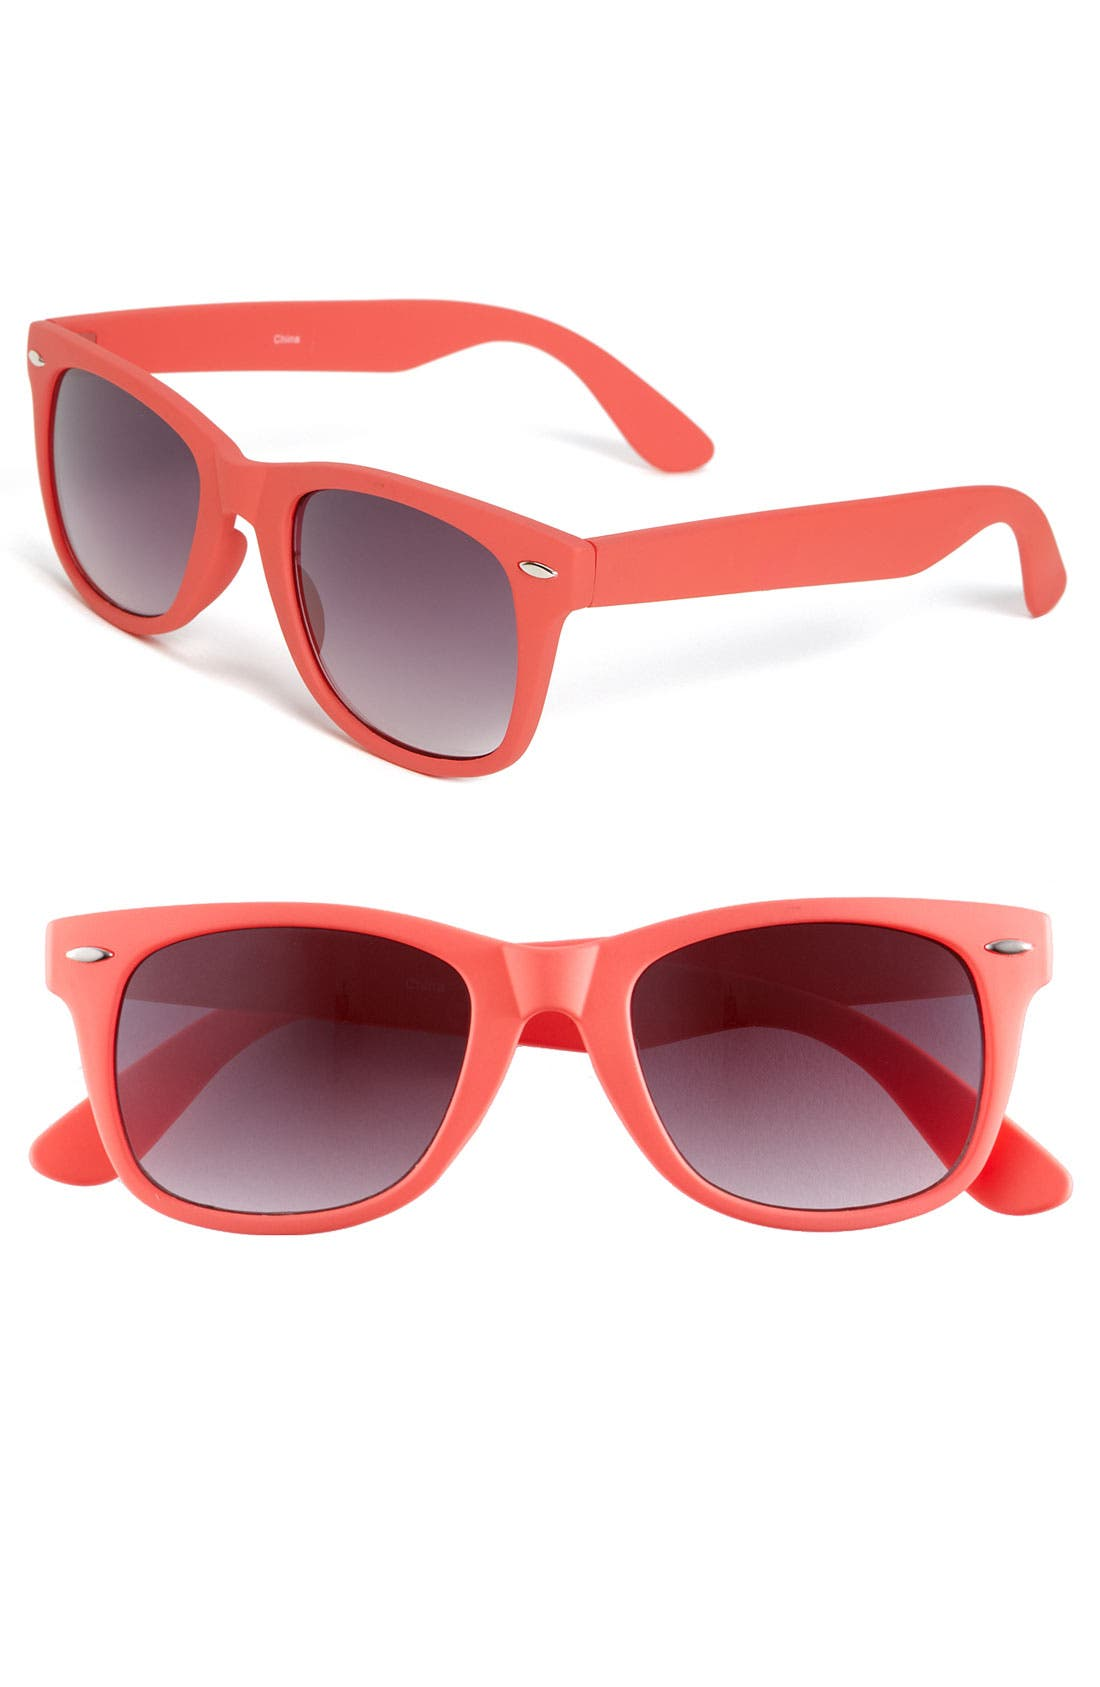 'Maureen' Sunglasses,                             Main thumbnail 1, color,                             650